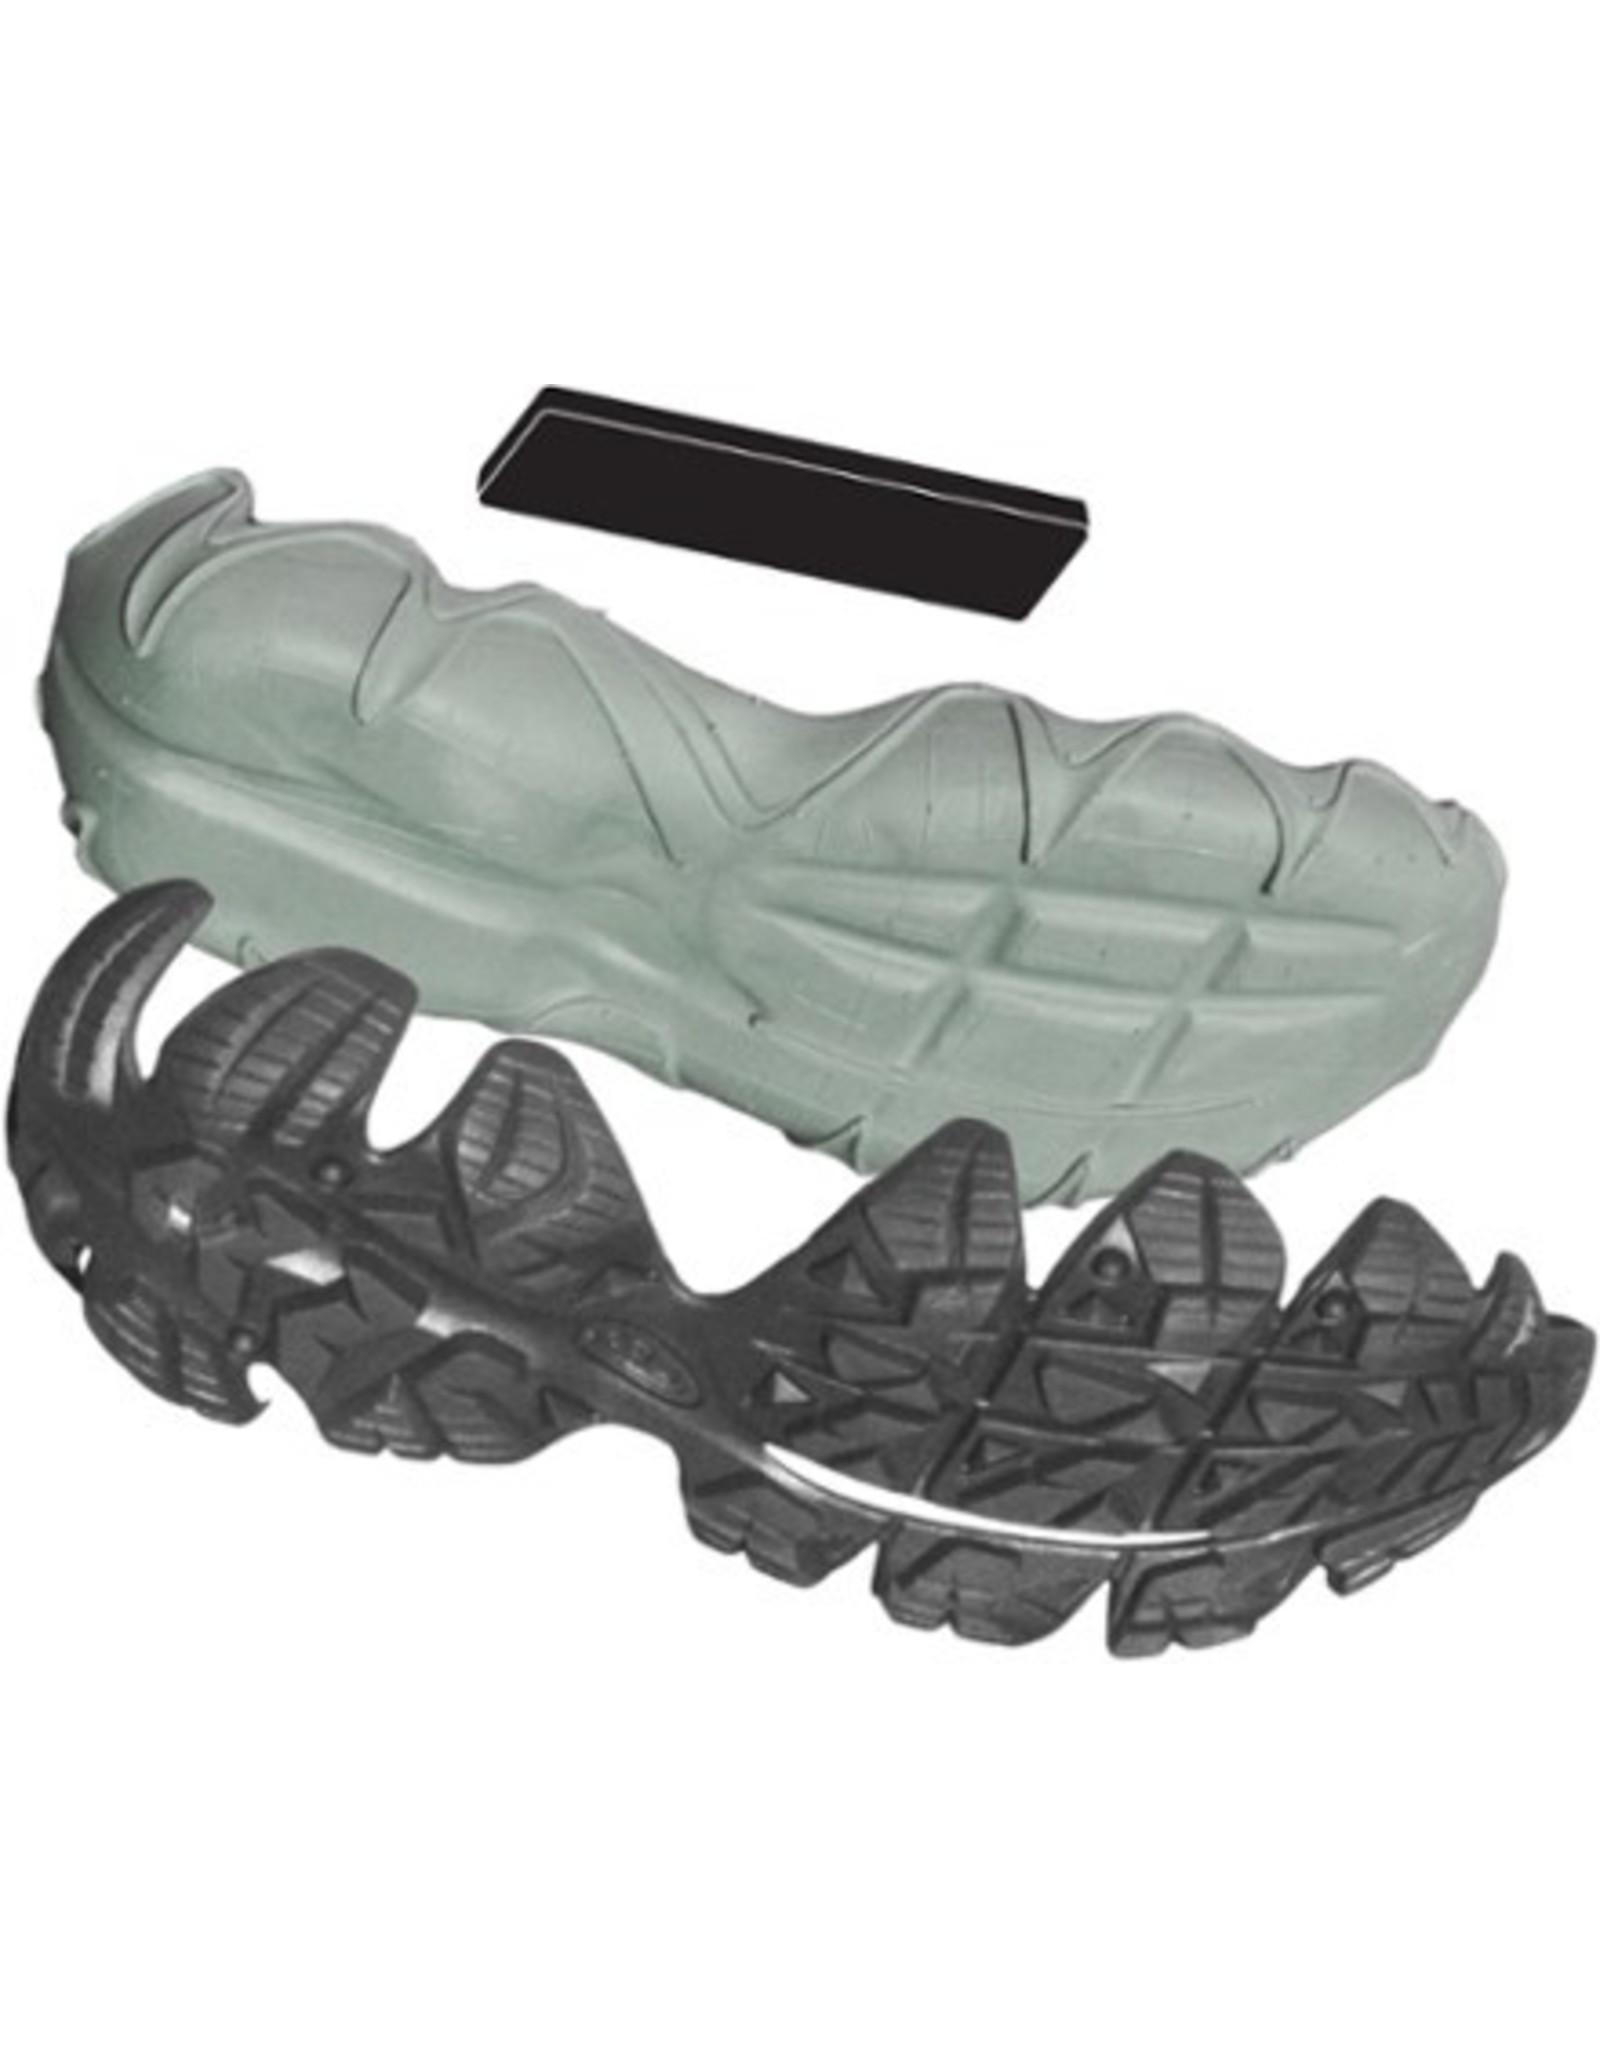 Oboz Footwear Oboz Livingston Low Men's Dark Shadow 13